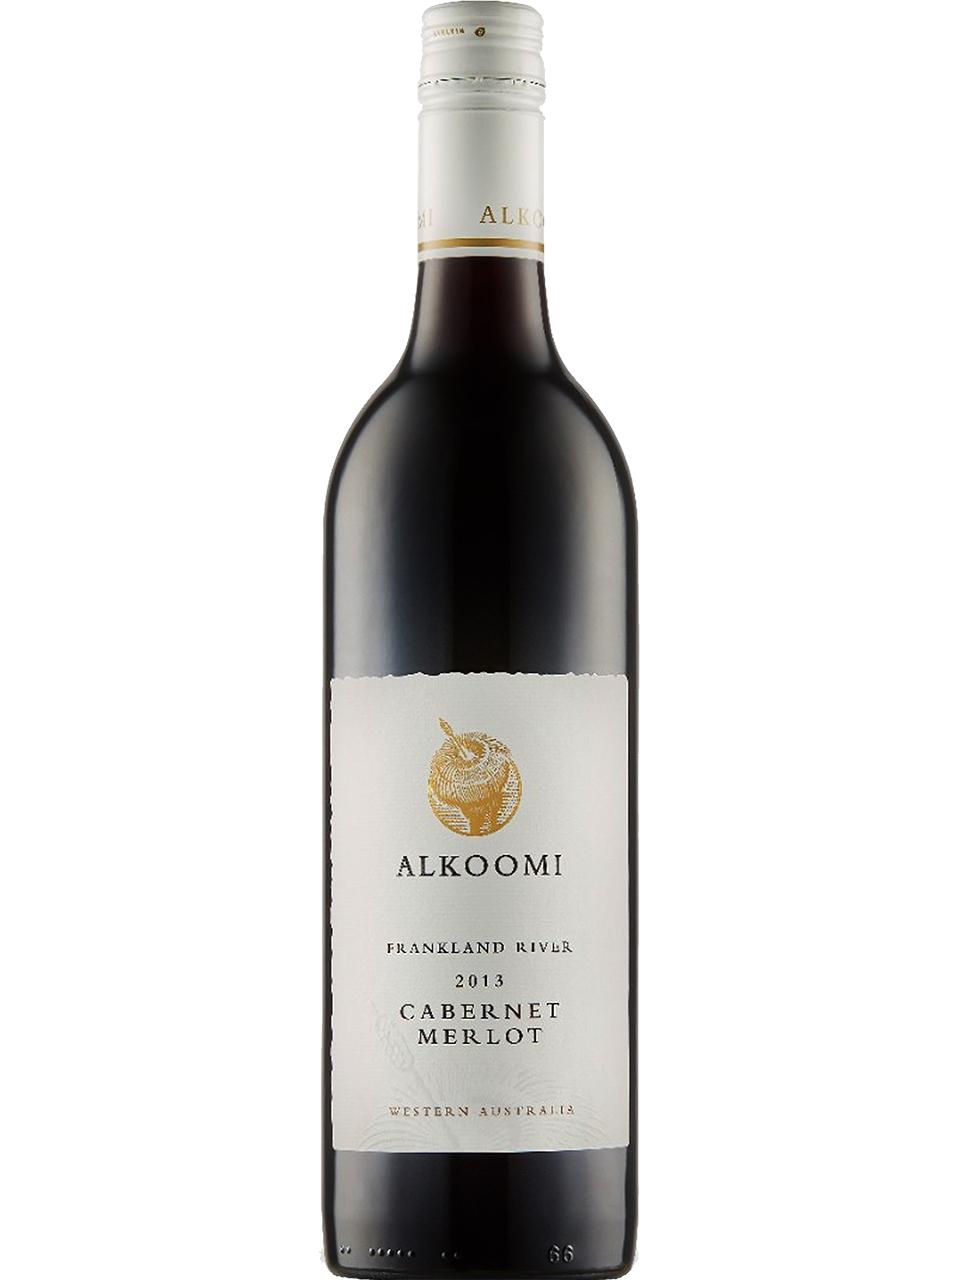 Alkoomi White Label Cabernet Merlot